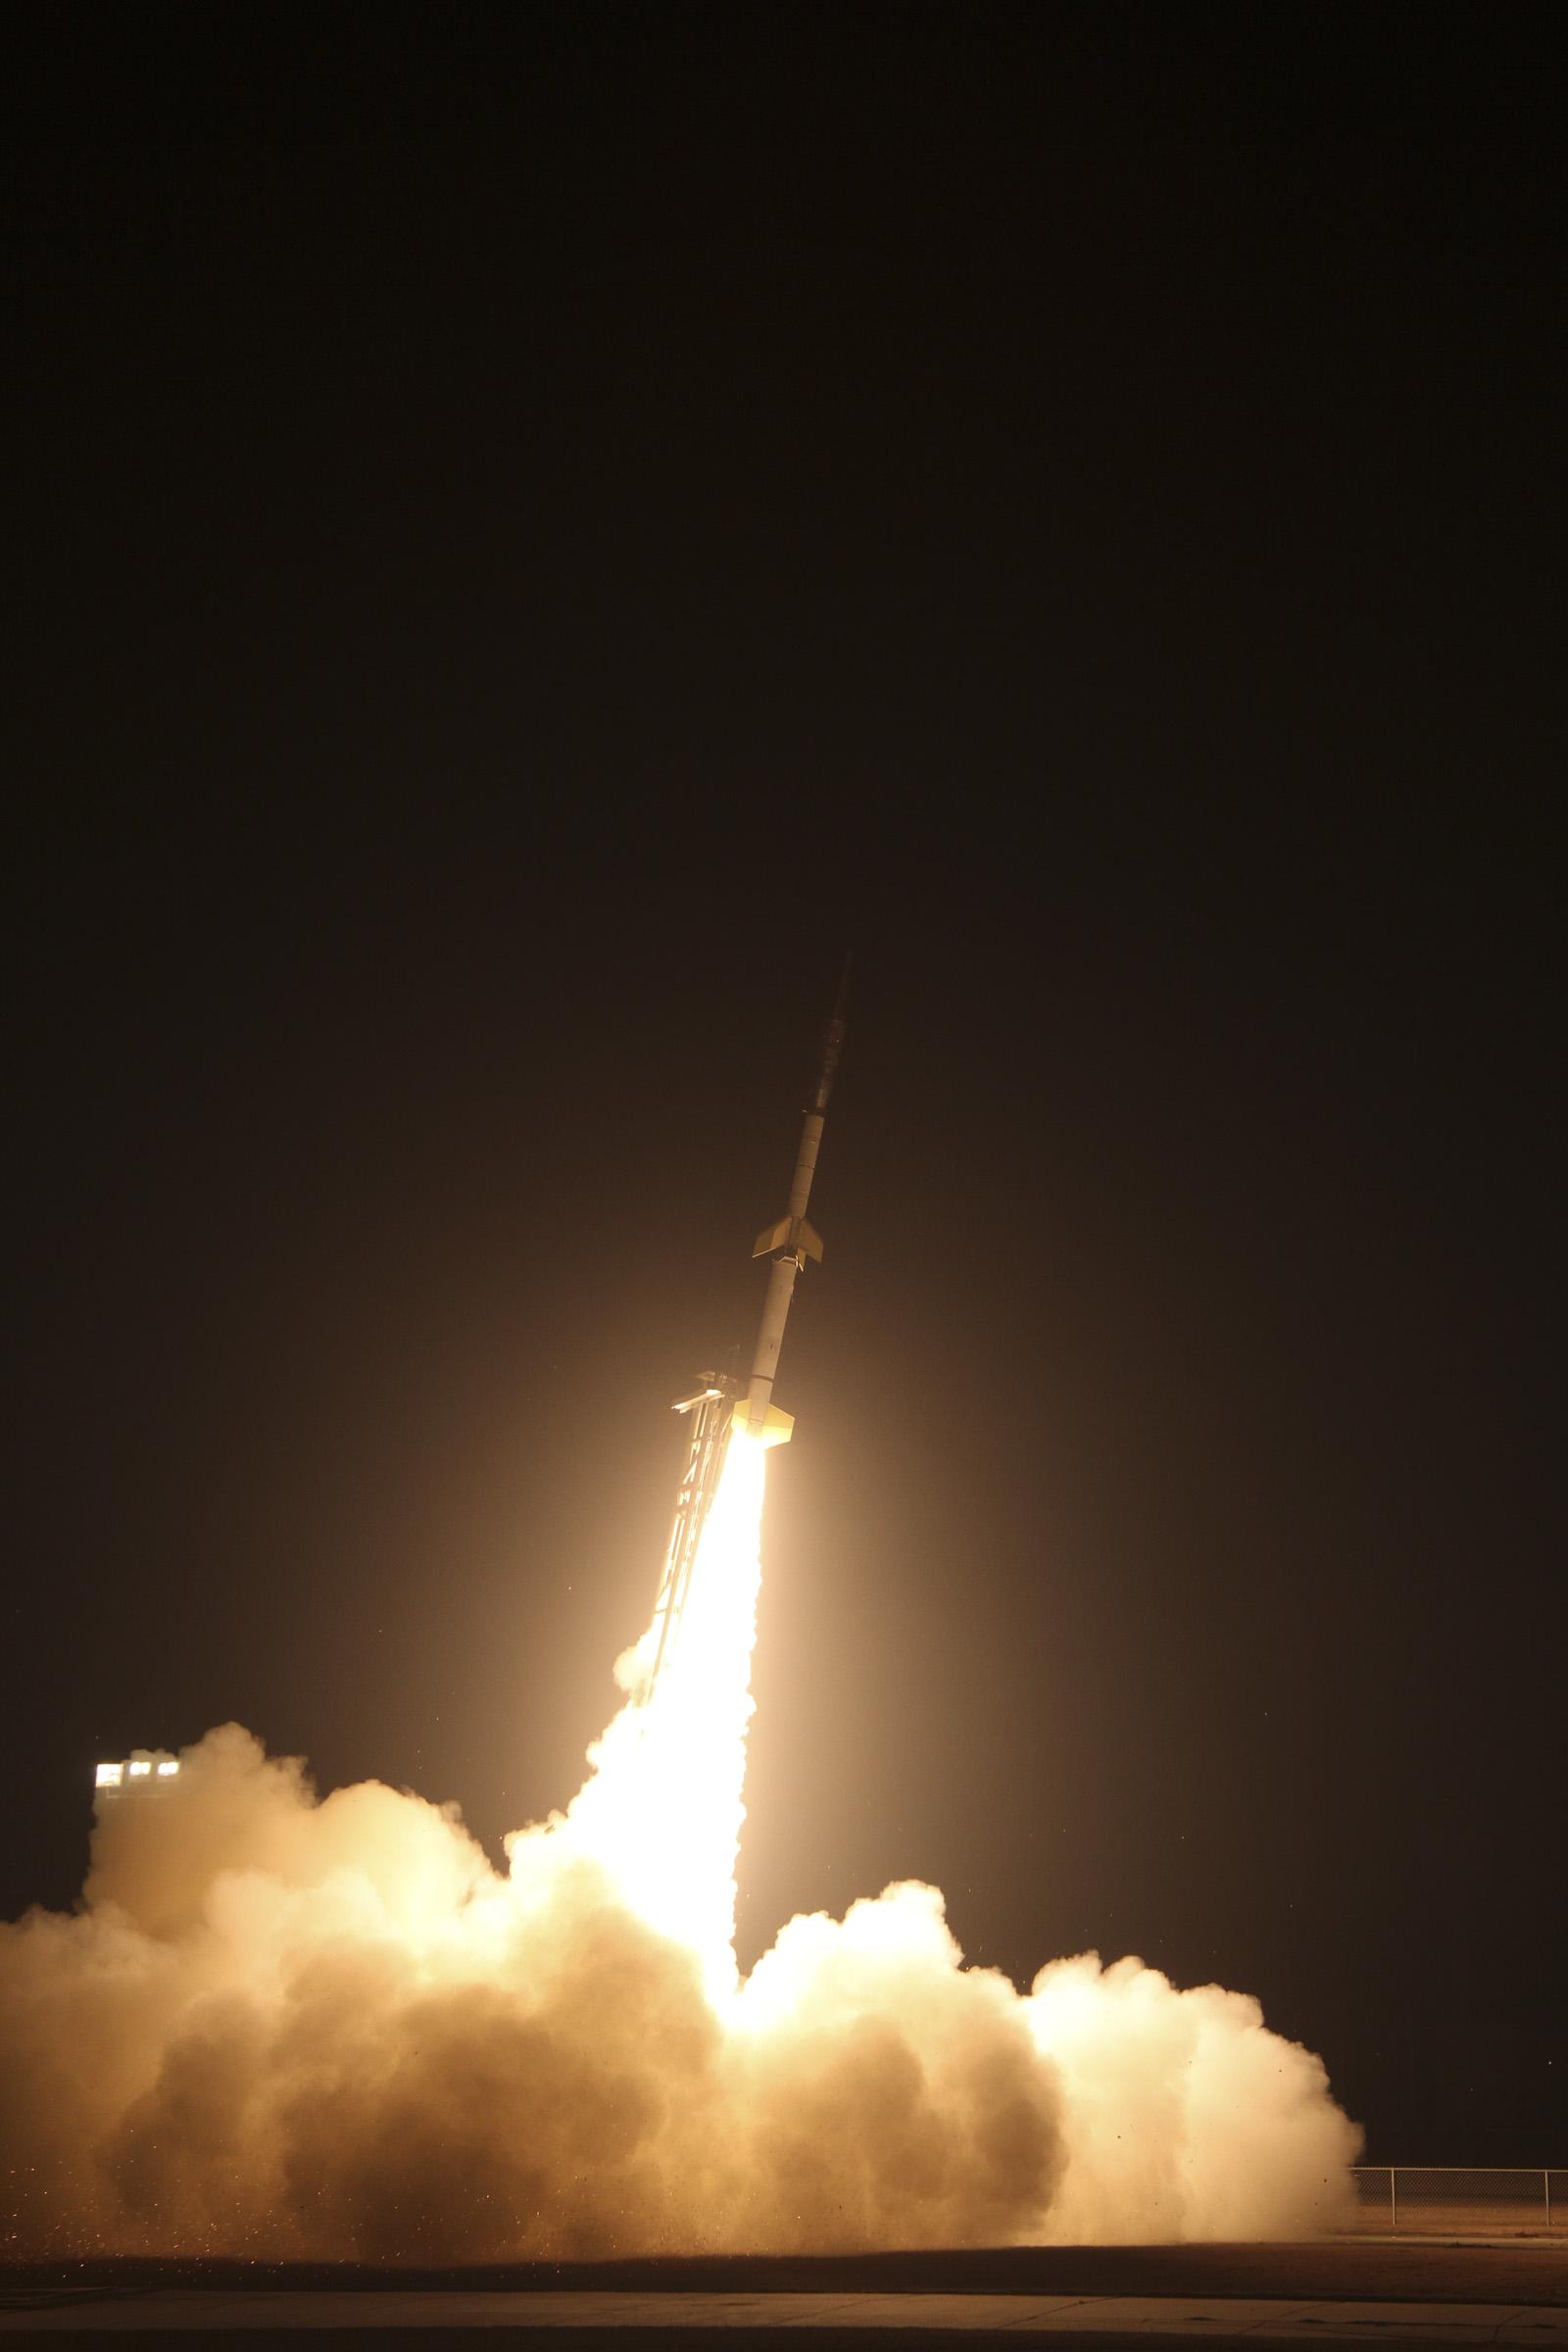 nasa wallops rocket launch - photo #5